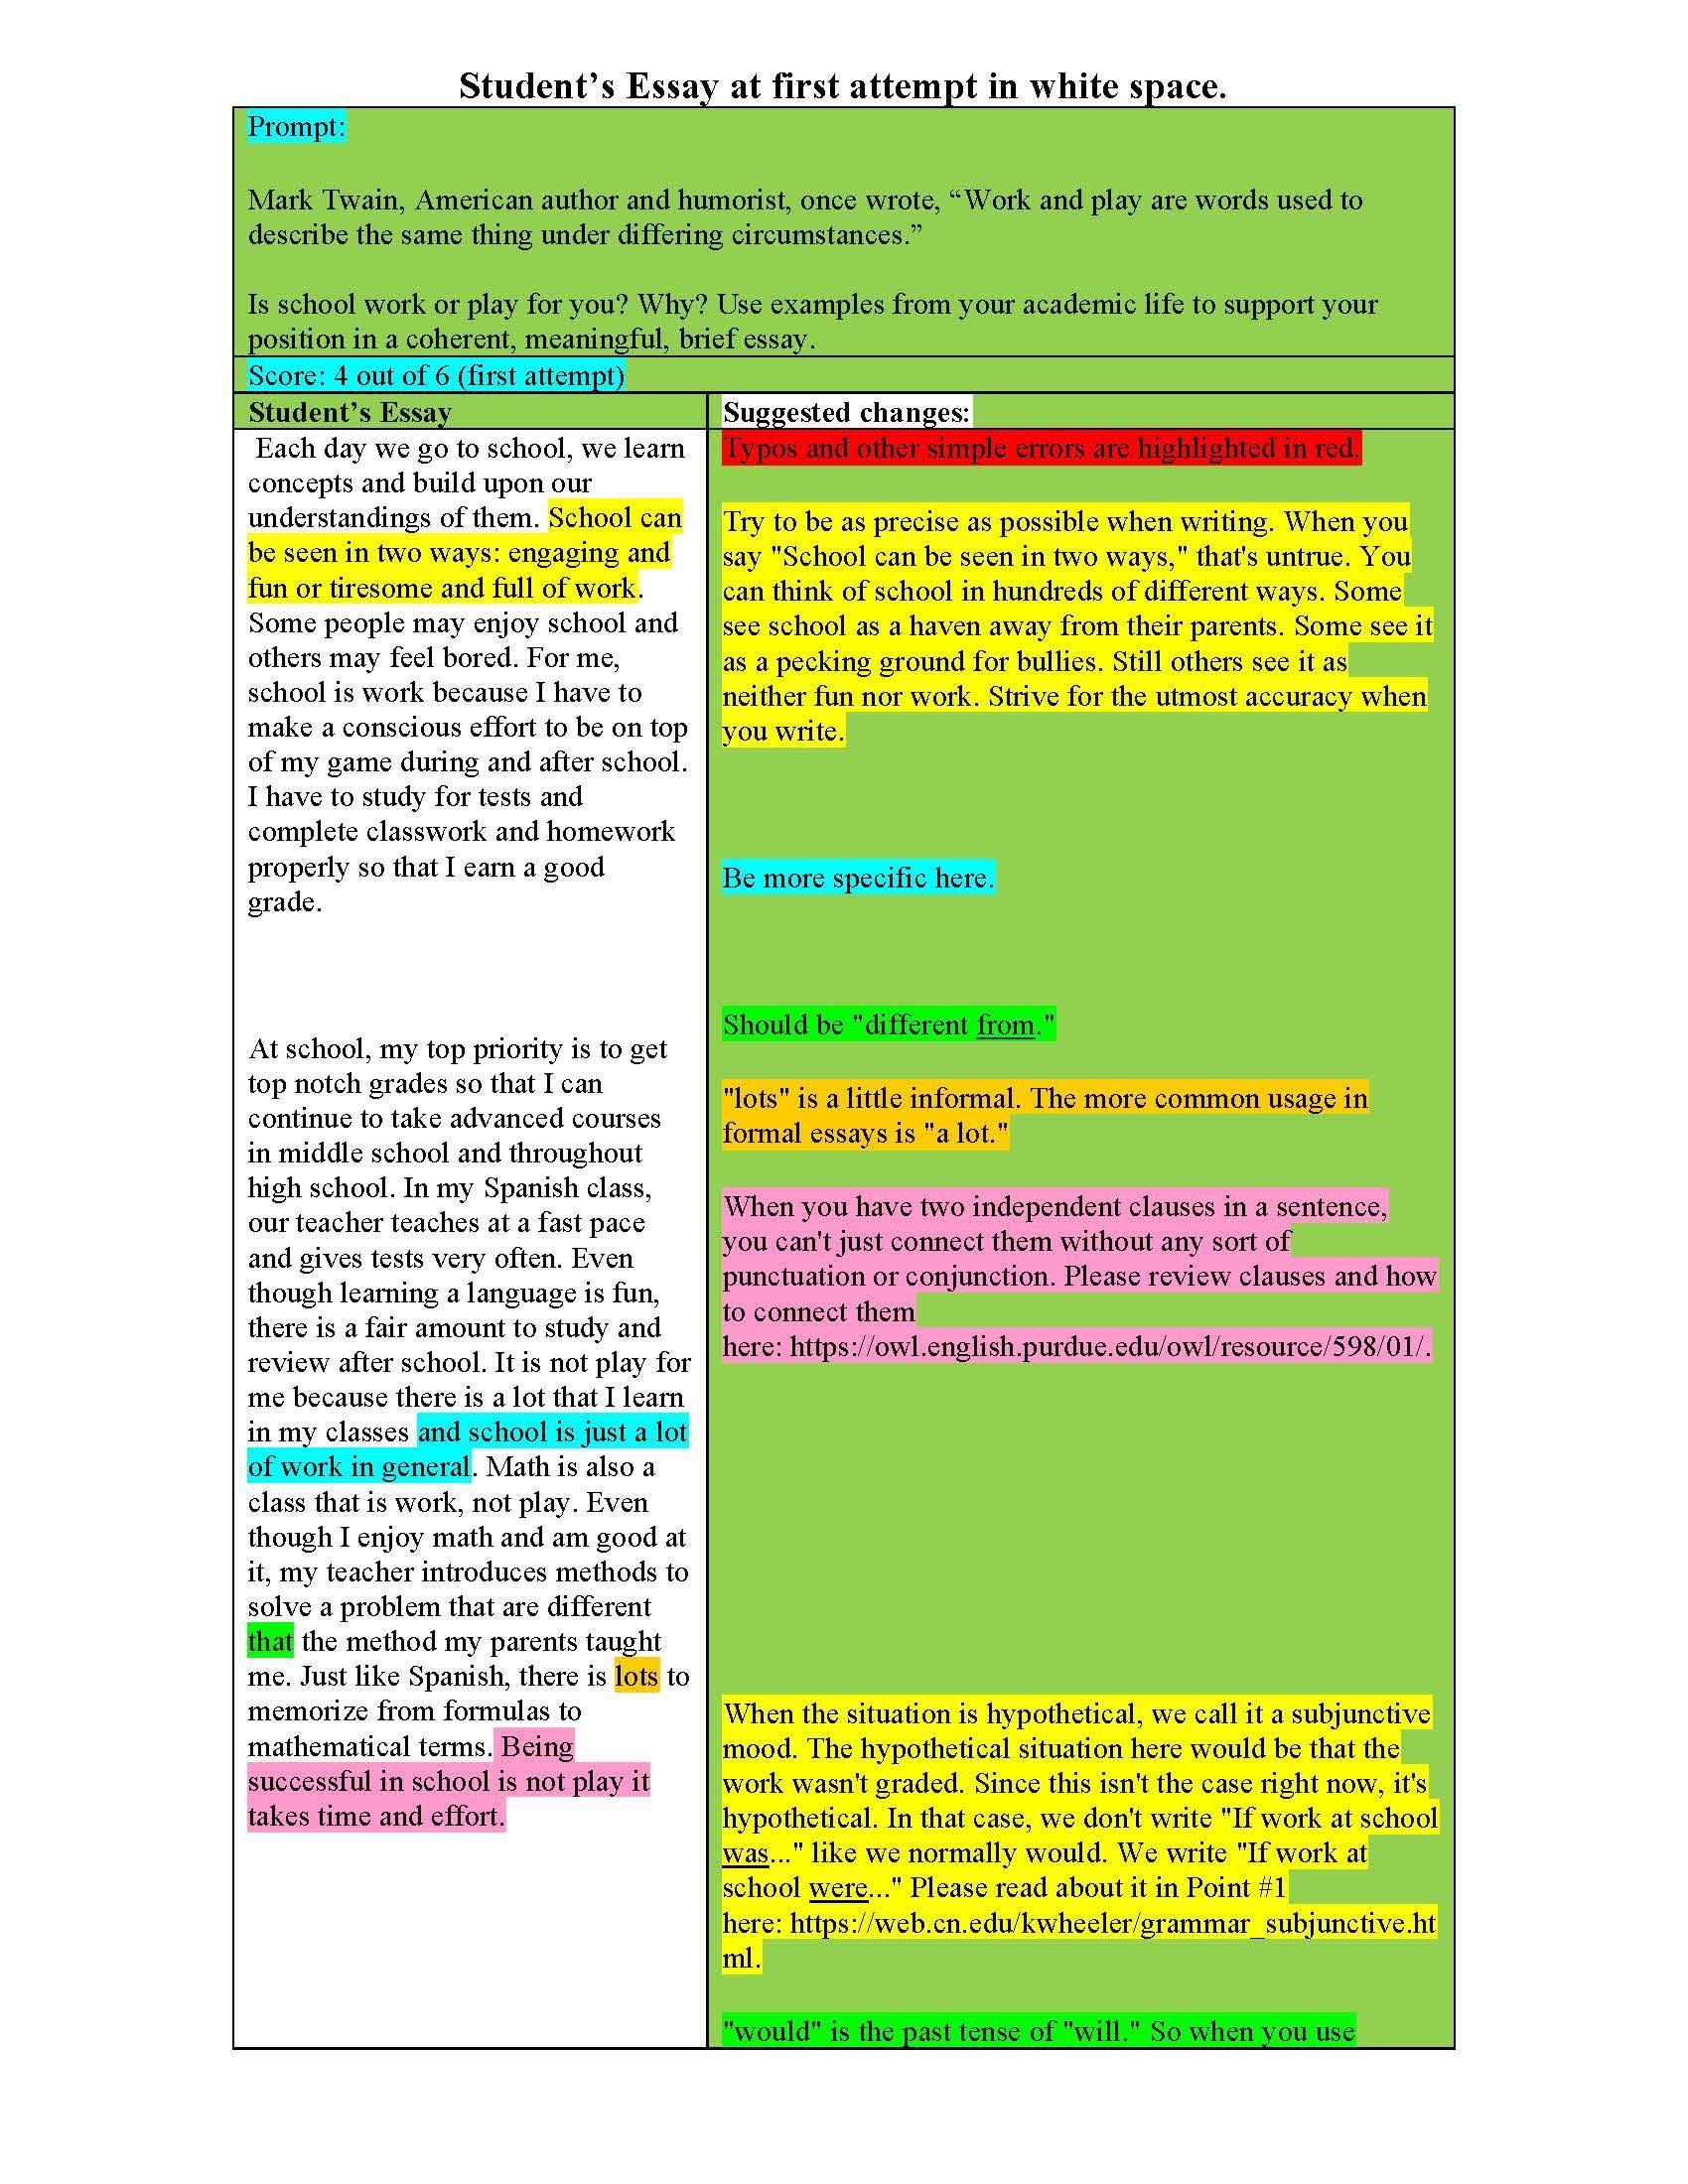 Dissertation written past tense